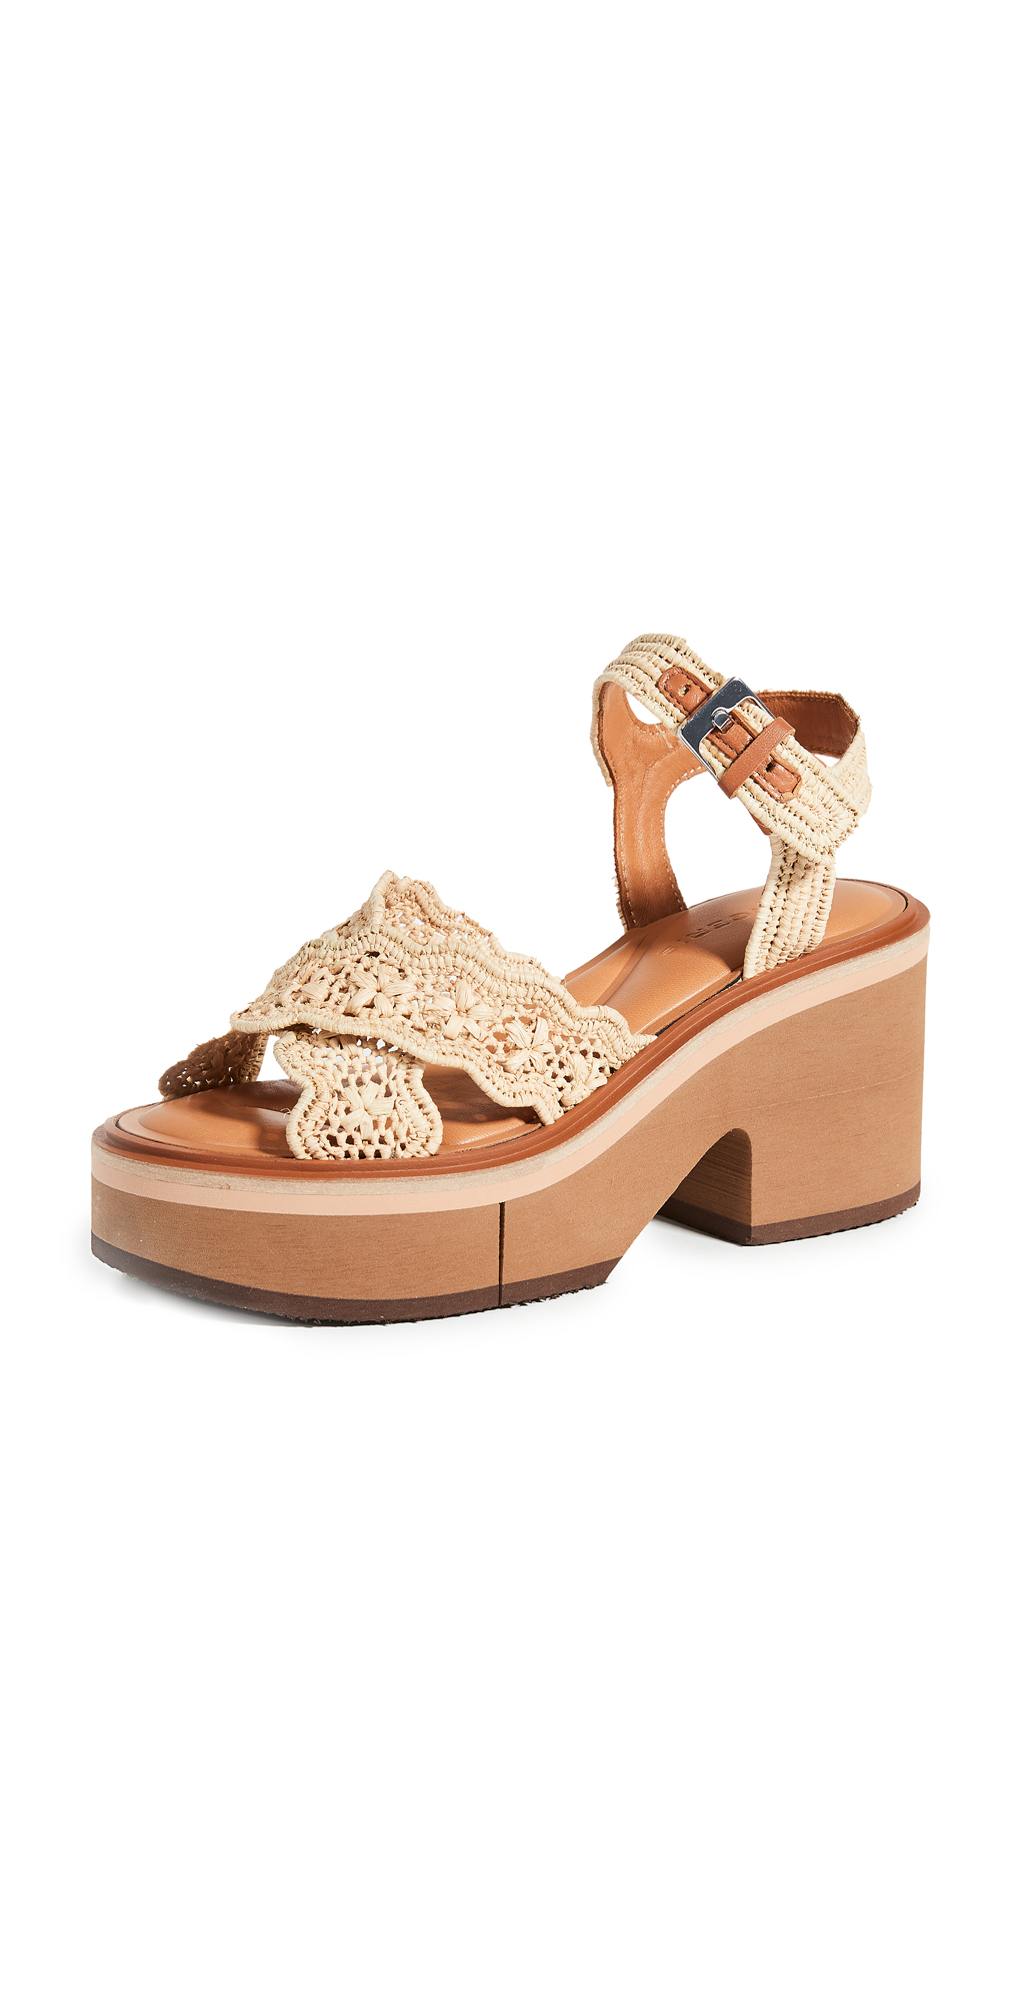 Clergerie Charlize Sandals